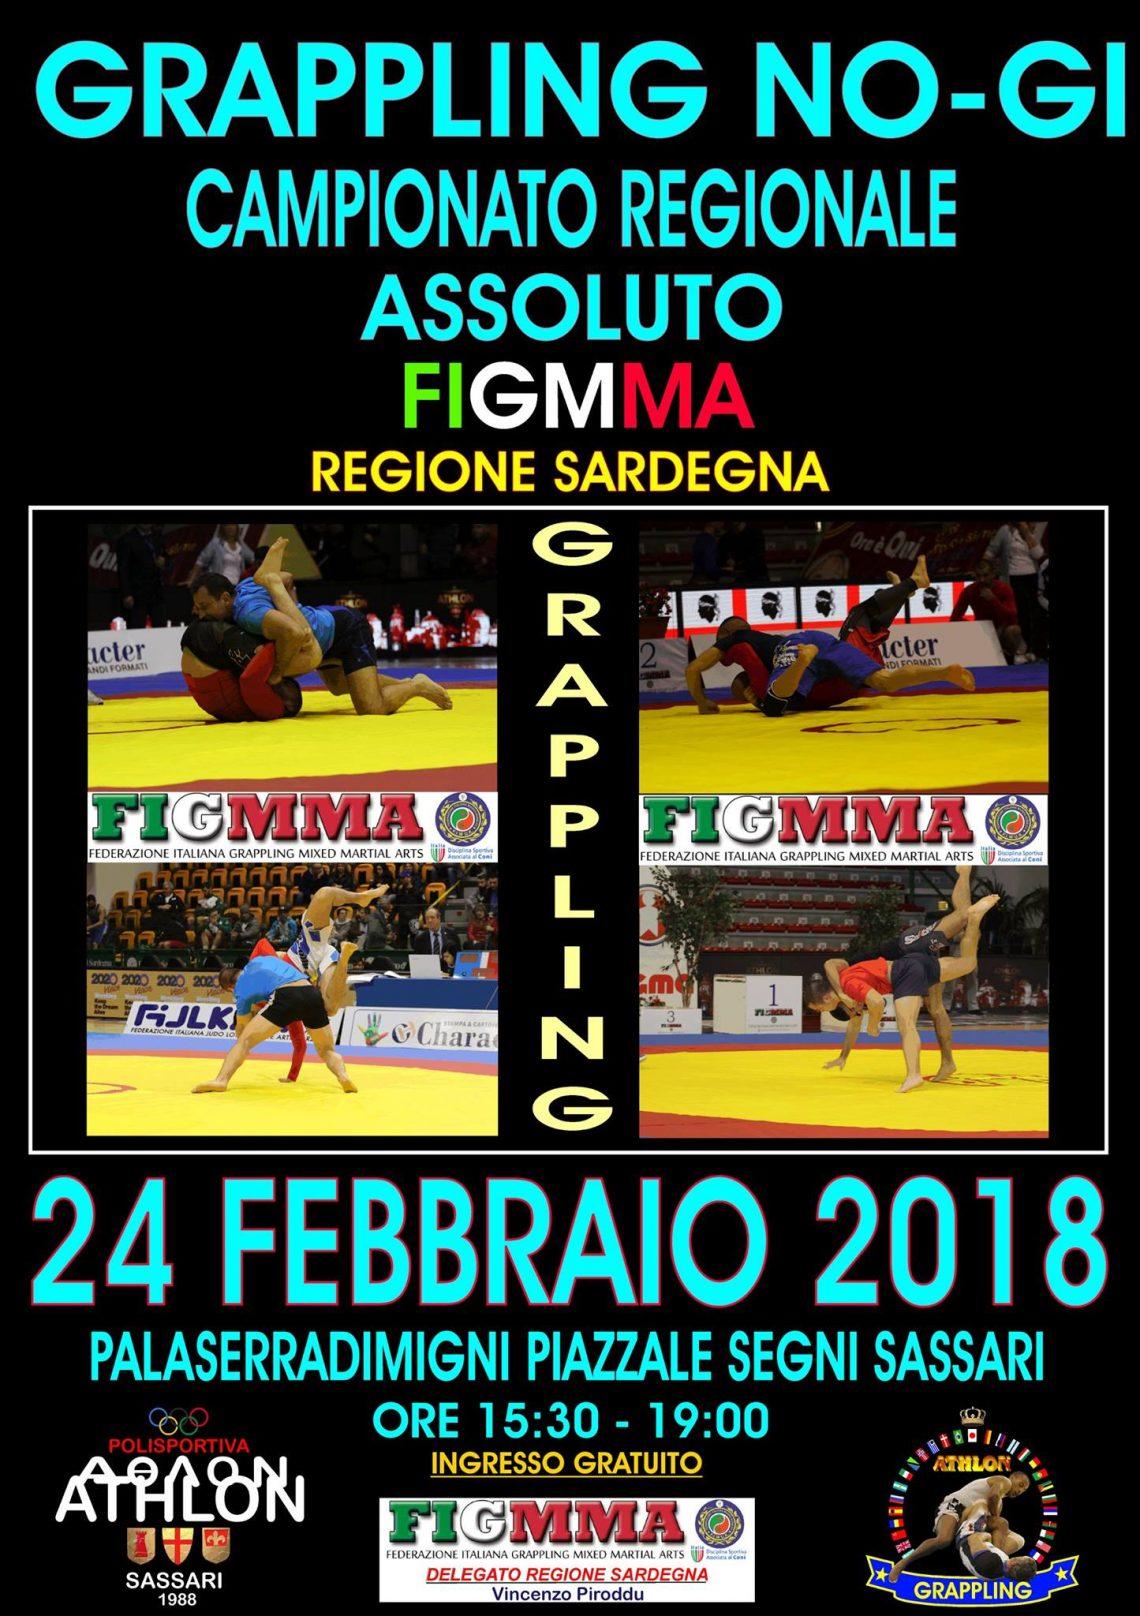 Grappling No gi - Campionato regionale Assoluto Sardegna (FigMMA) 1